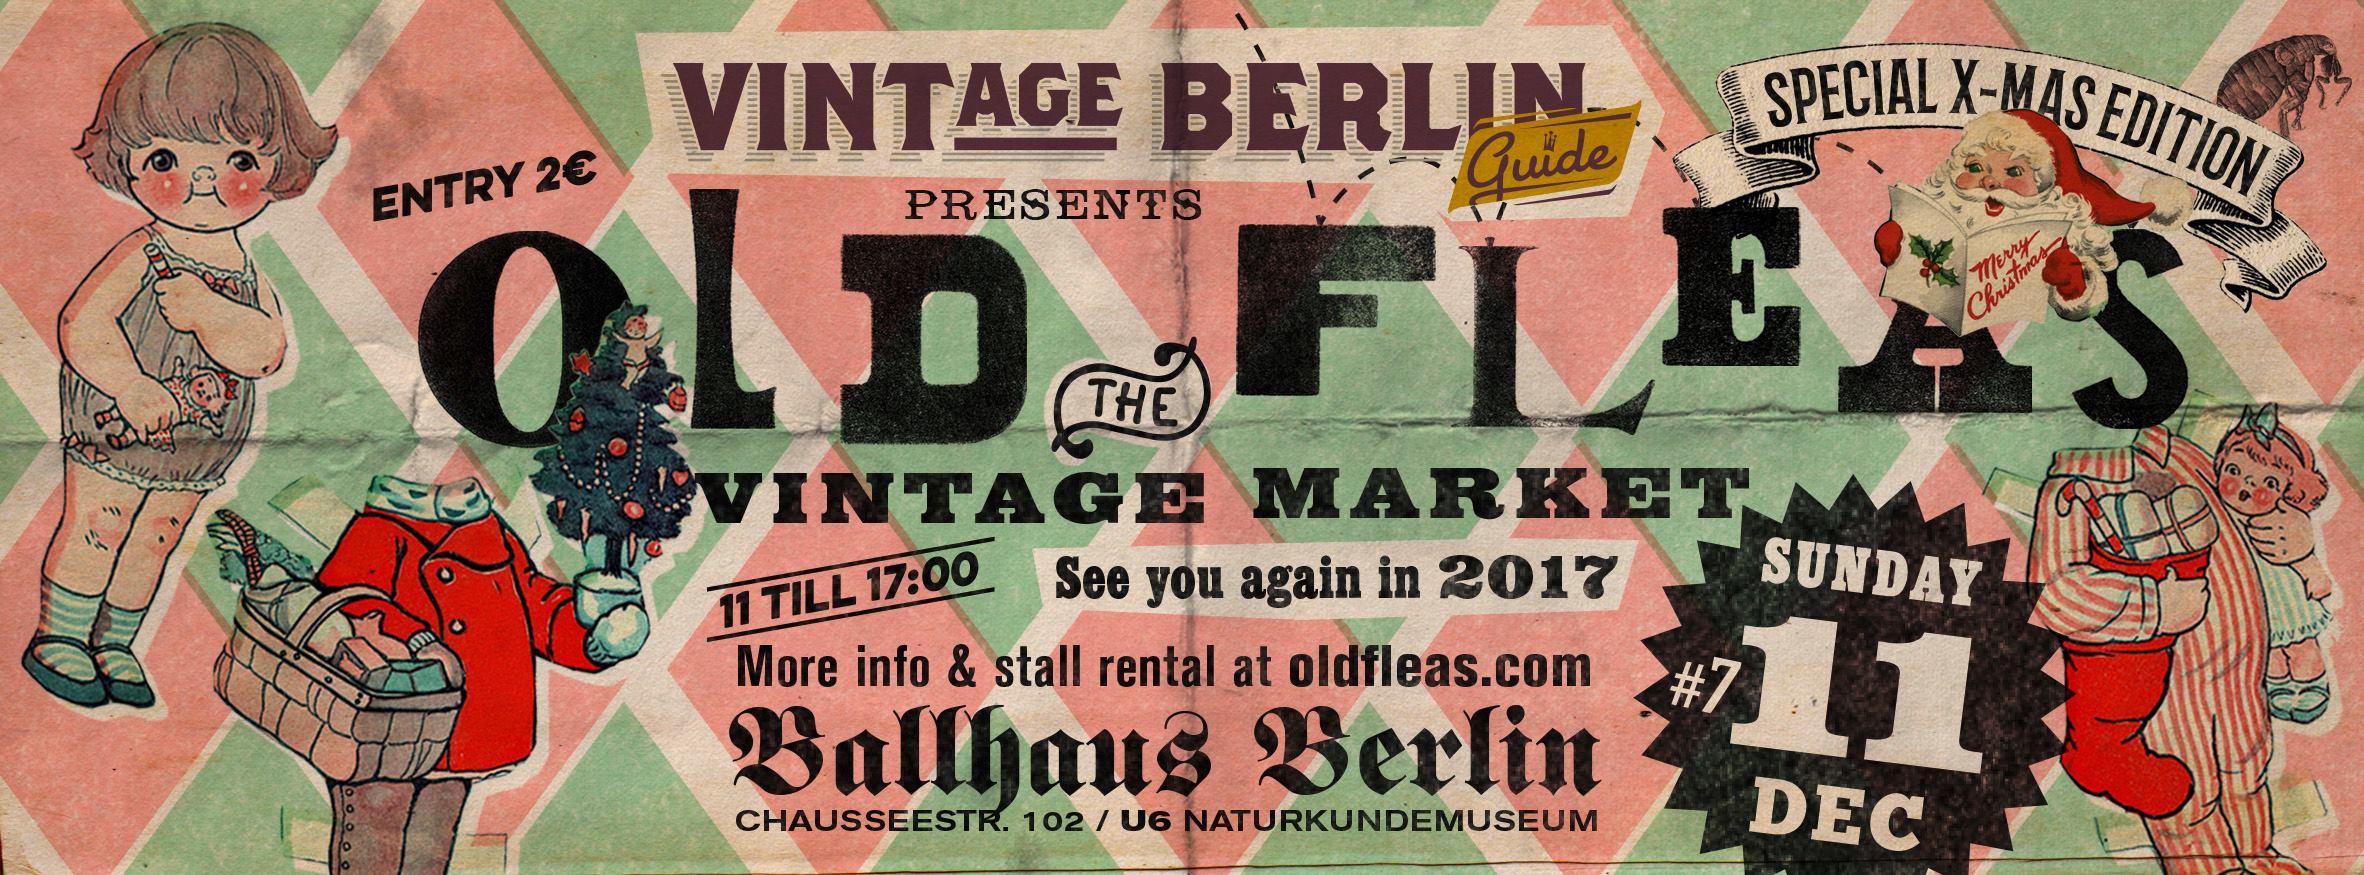 Old Fleas - The Vintage Market